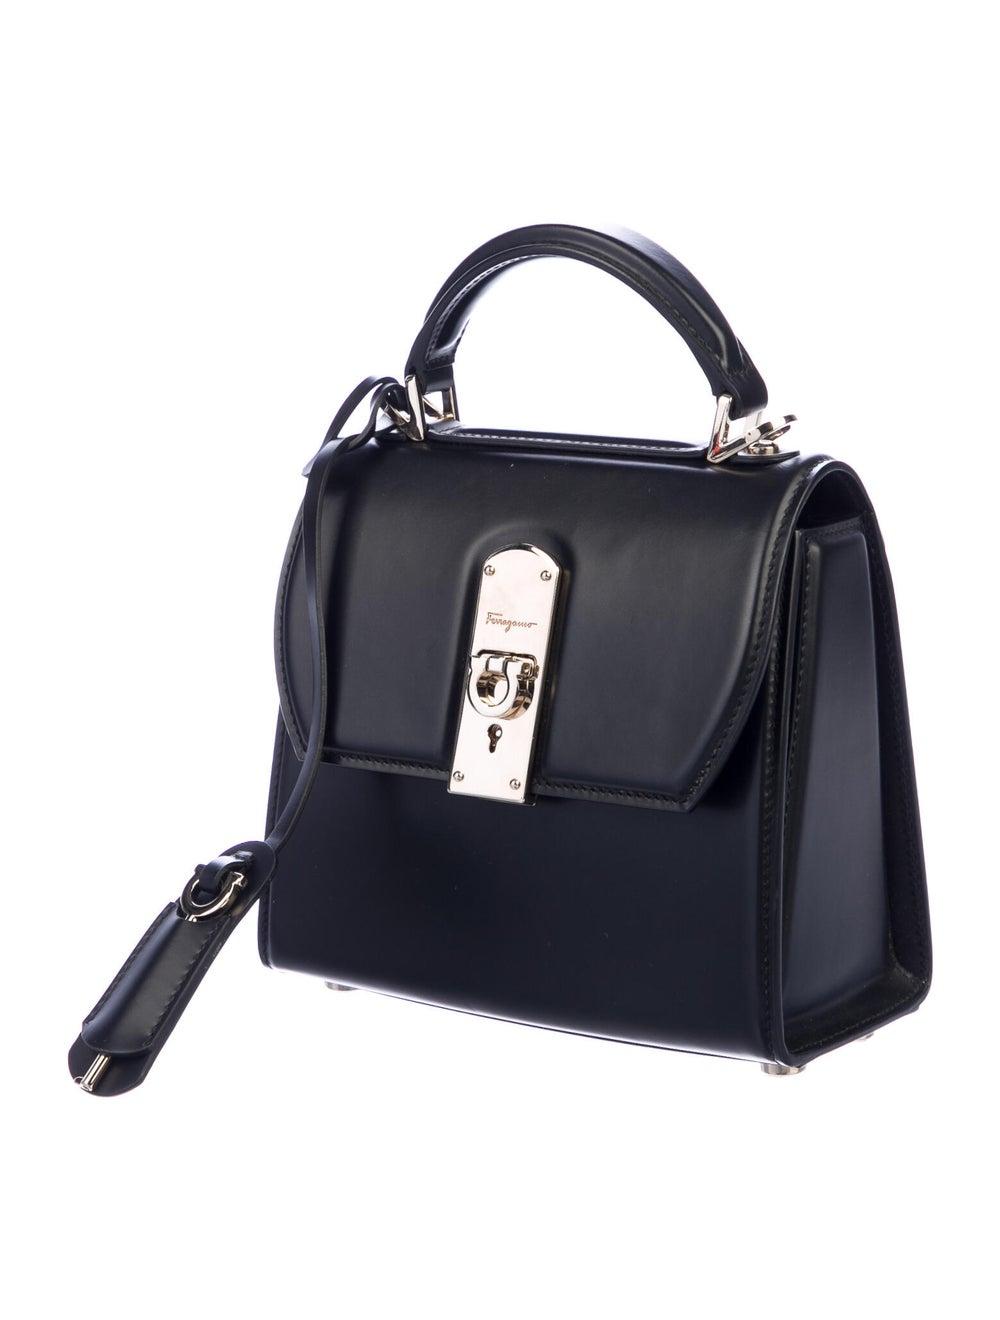 Salvatore Ferragamo Leather Boxyz Bag Black - image 3